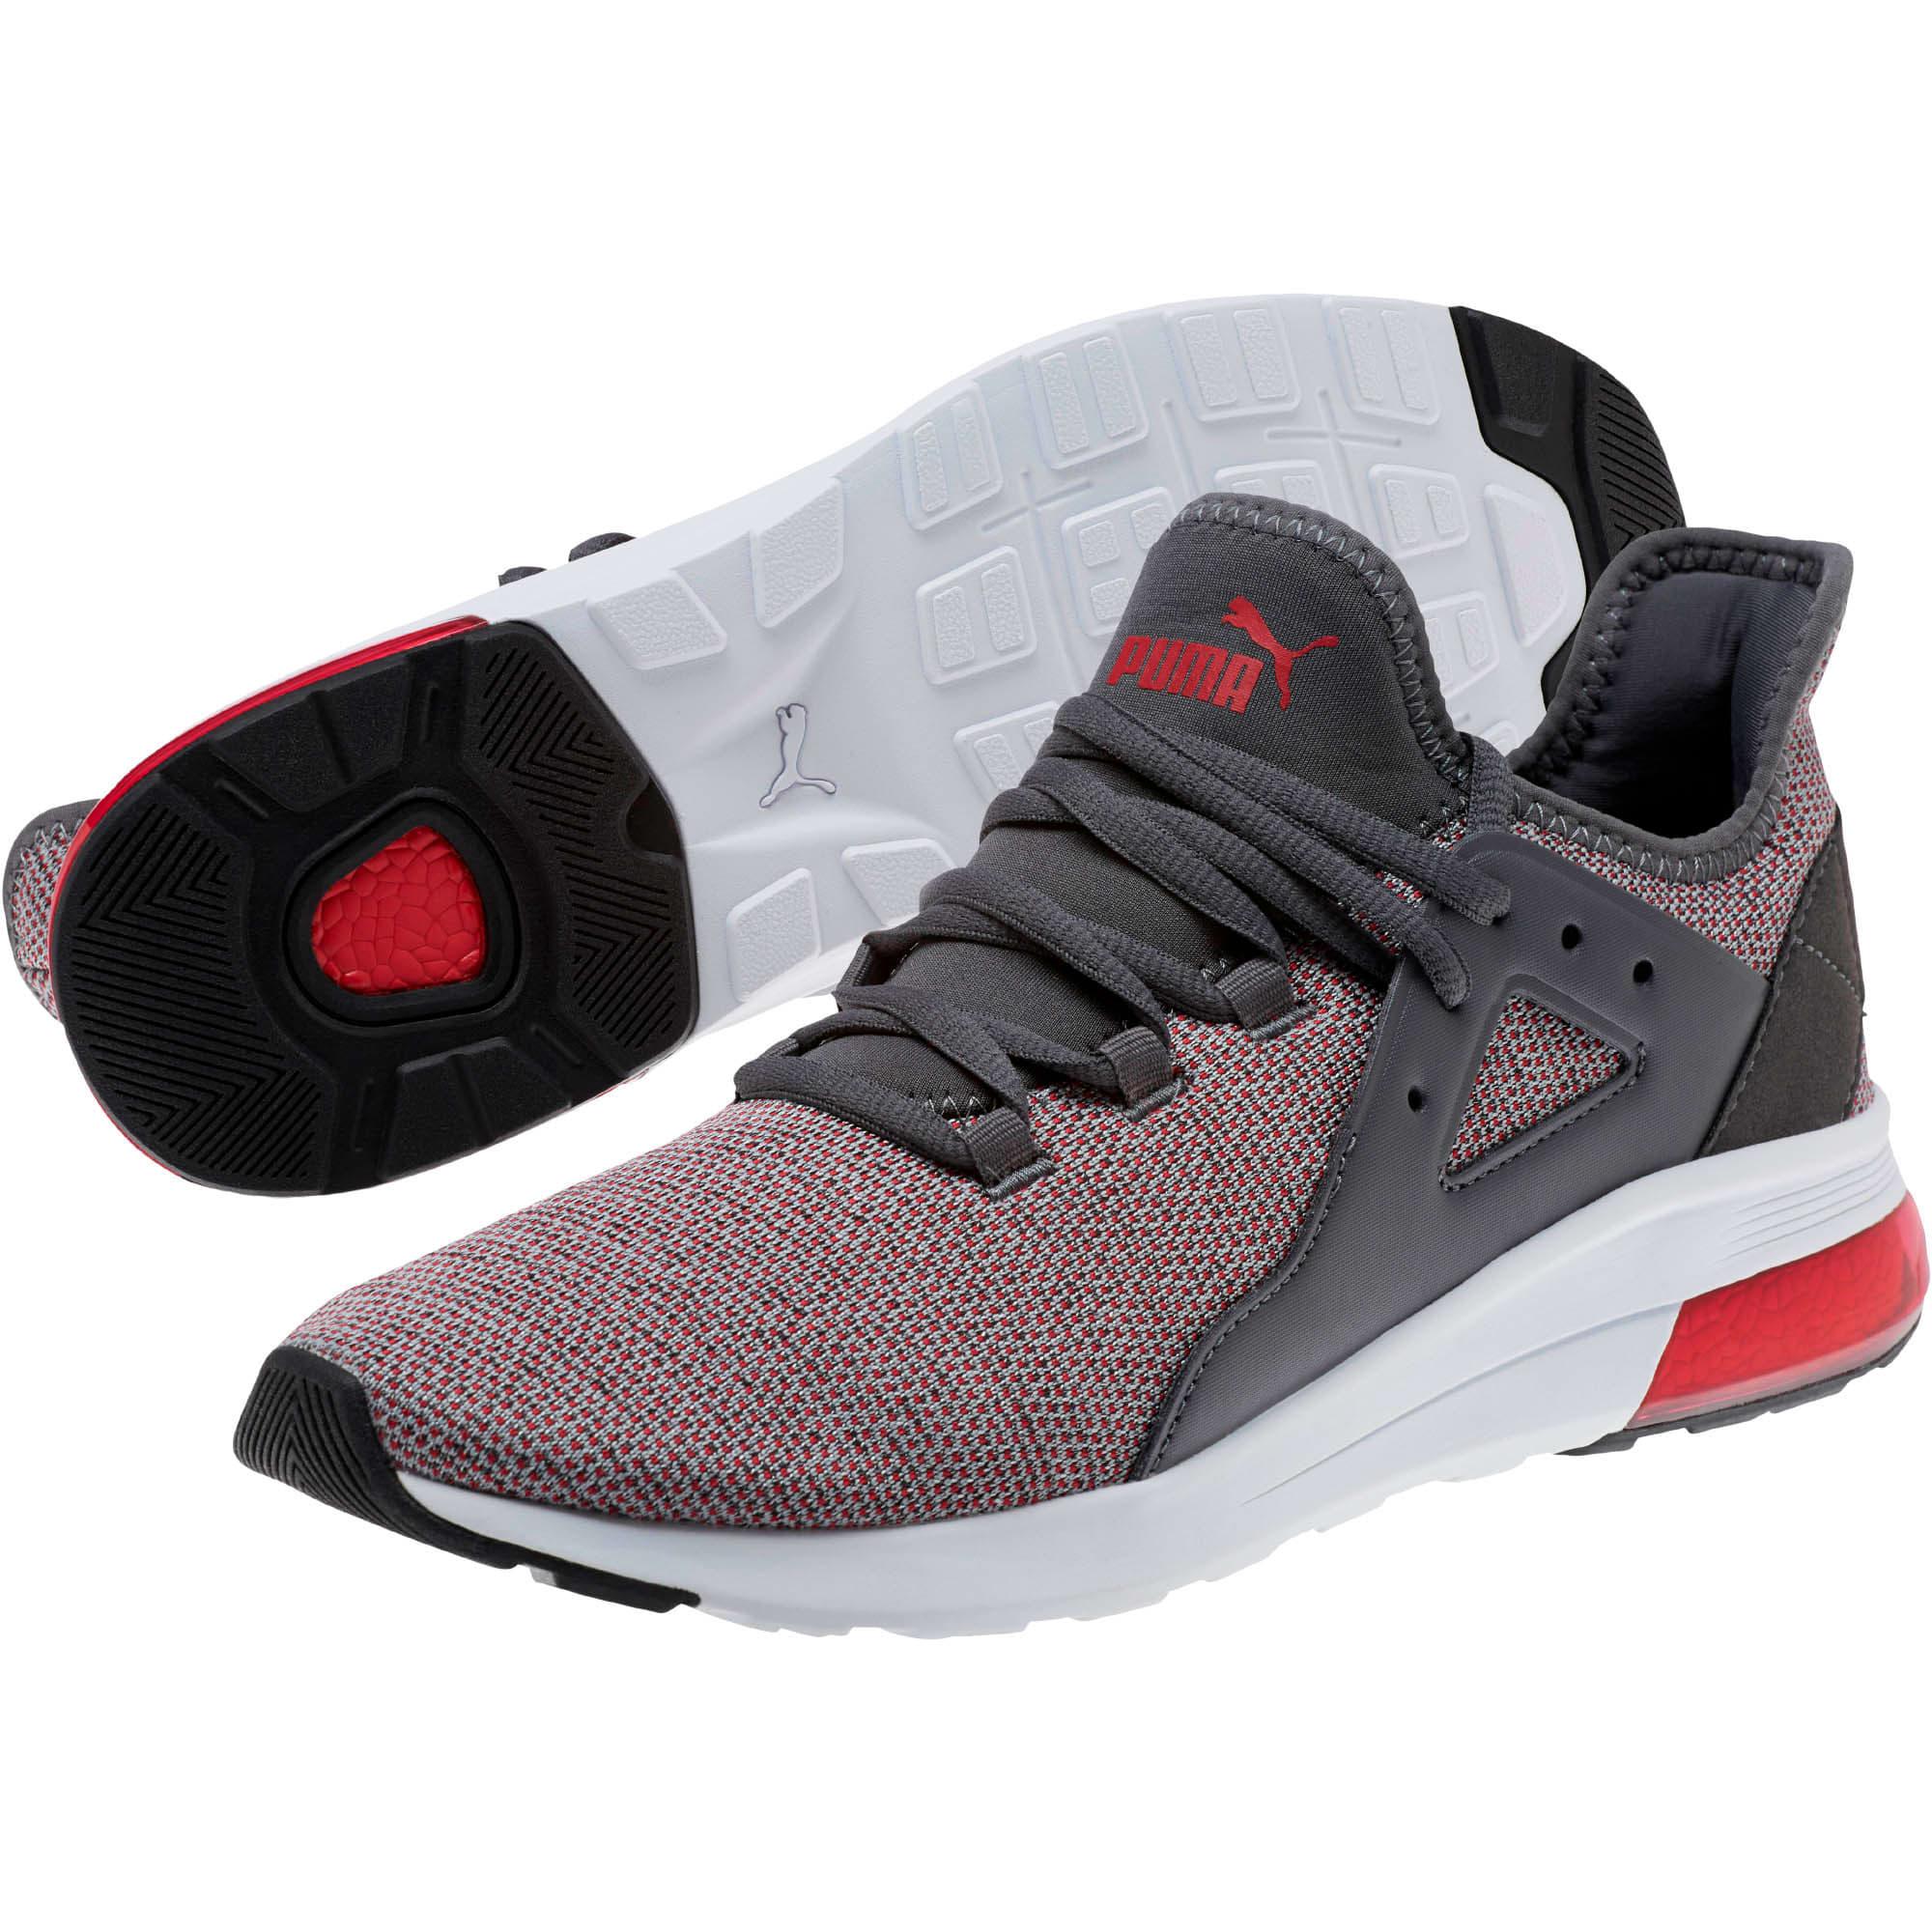 Thumbnail 2 of Electron Street Knit Sneakers, Iron Gate-Ribbon Red, medium